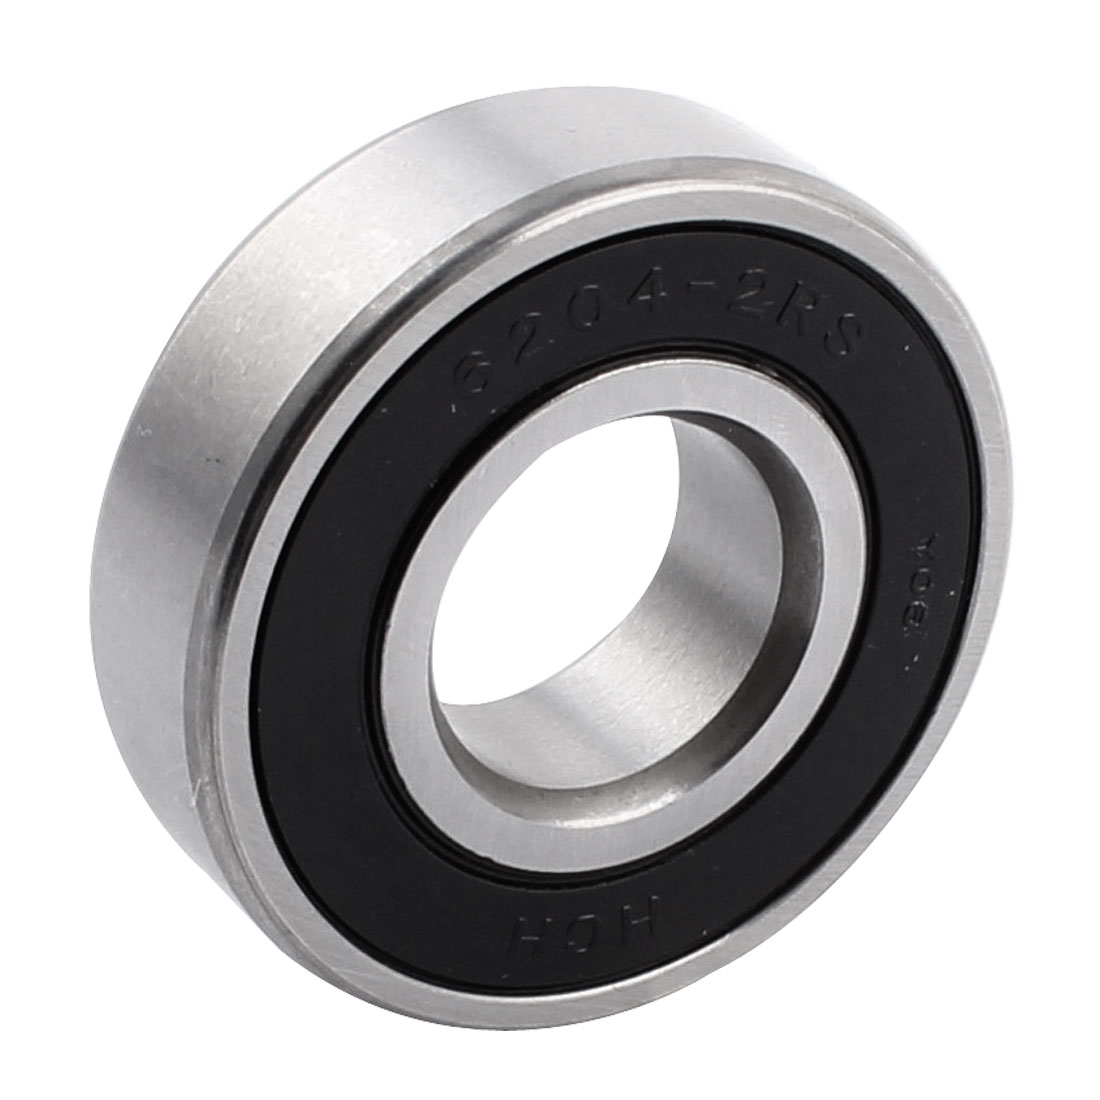 47mm x 20mm x 14mm 6204-2RS Sealing Rubber Groove Ball Wheel Bearings